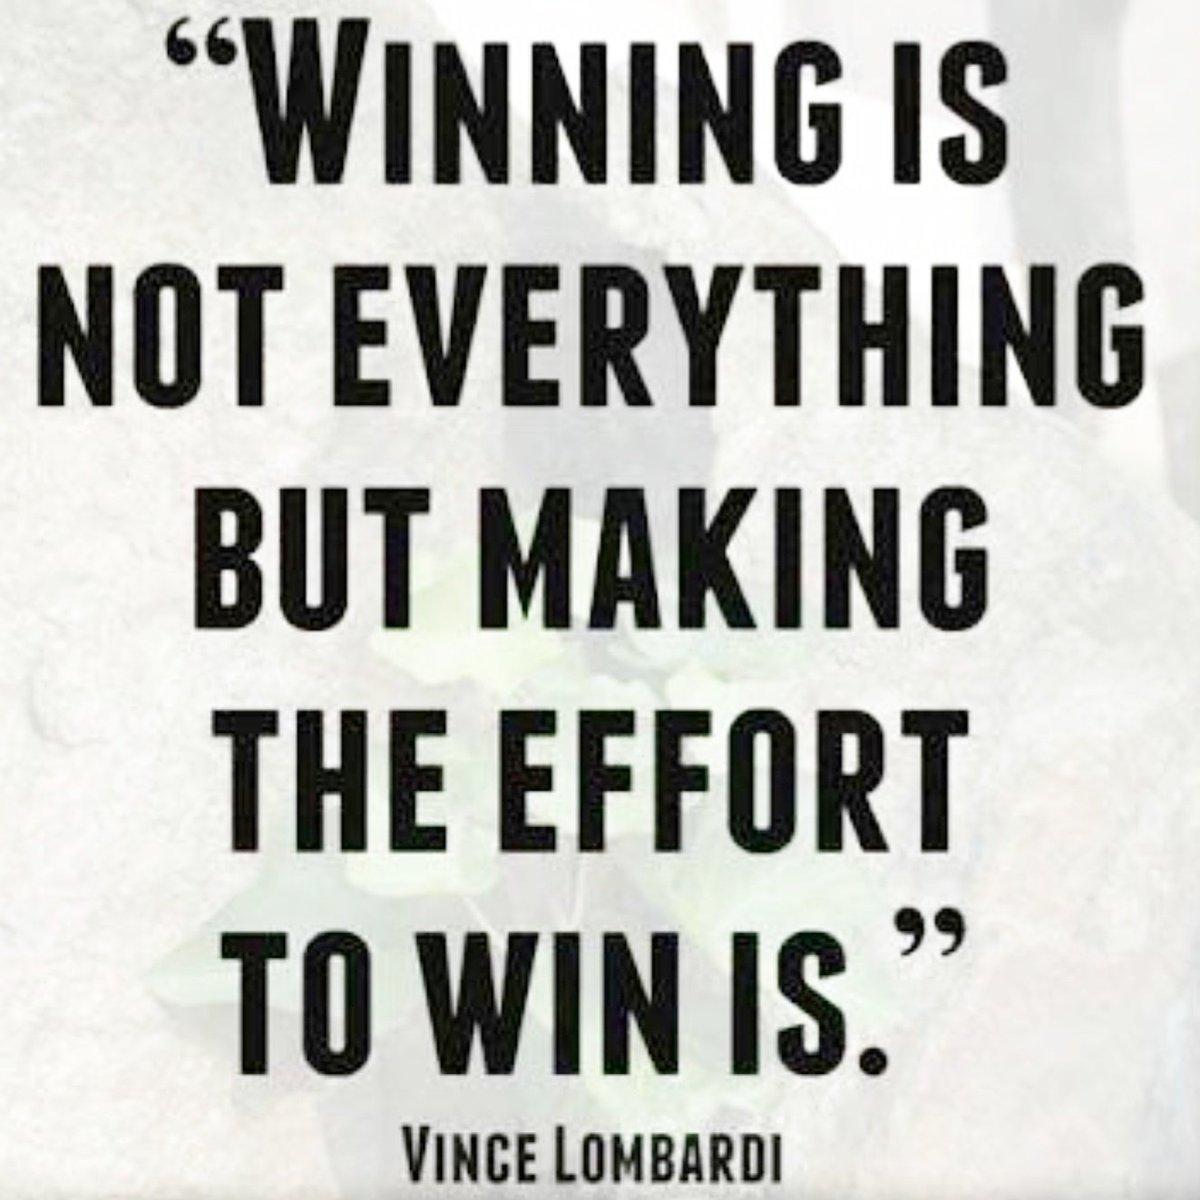 So true #VinceLombardi #HerSportsCorner<br>http://pic.twitter.com/IvjLqgAX9L